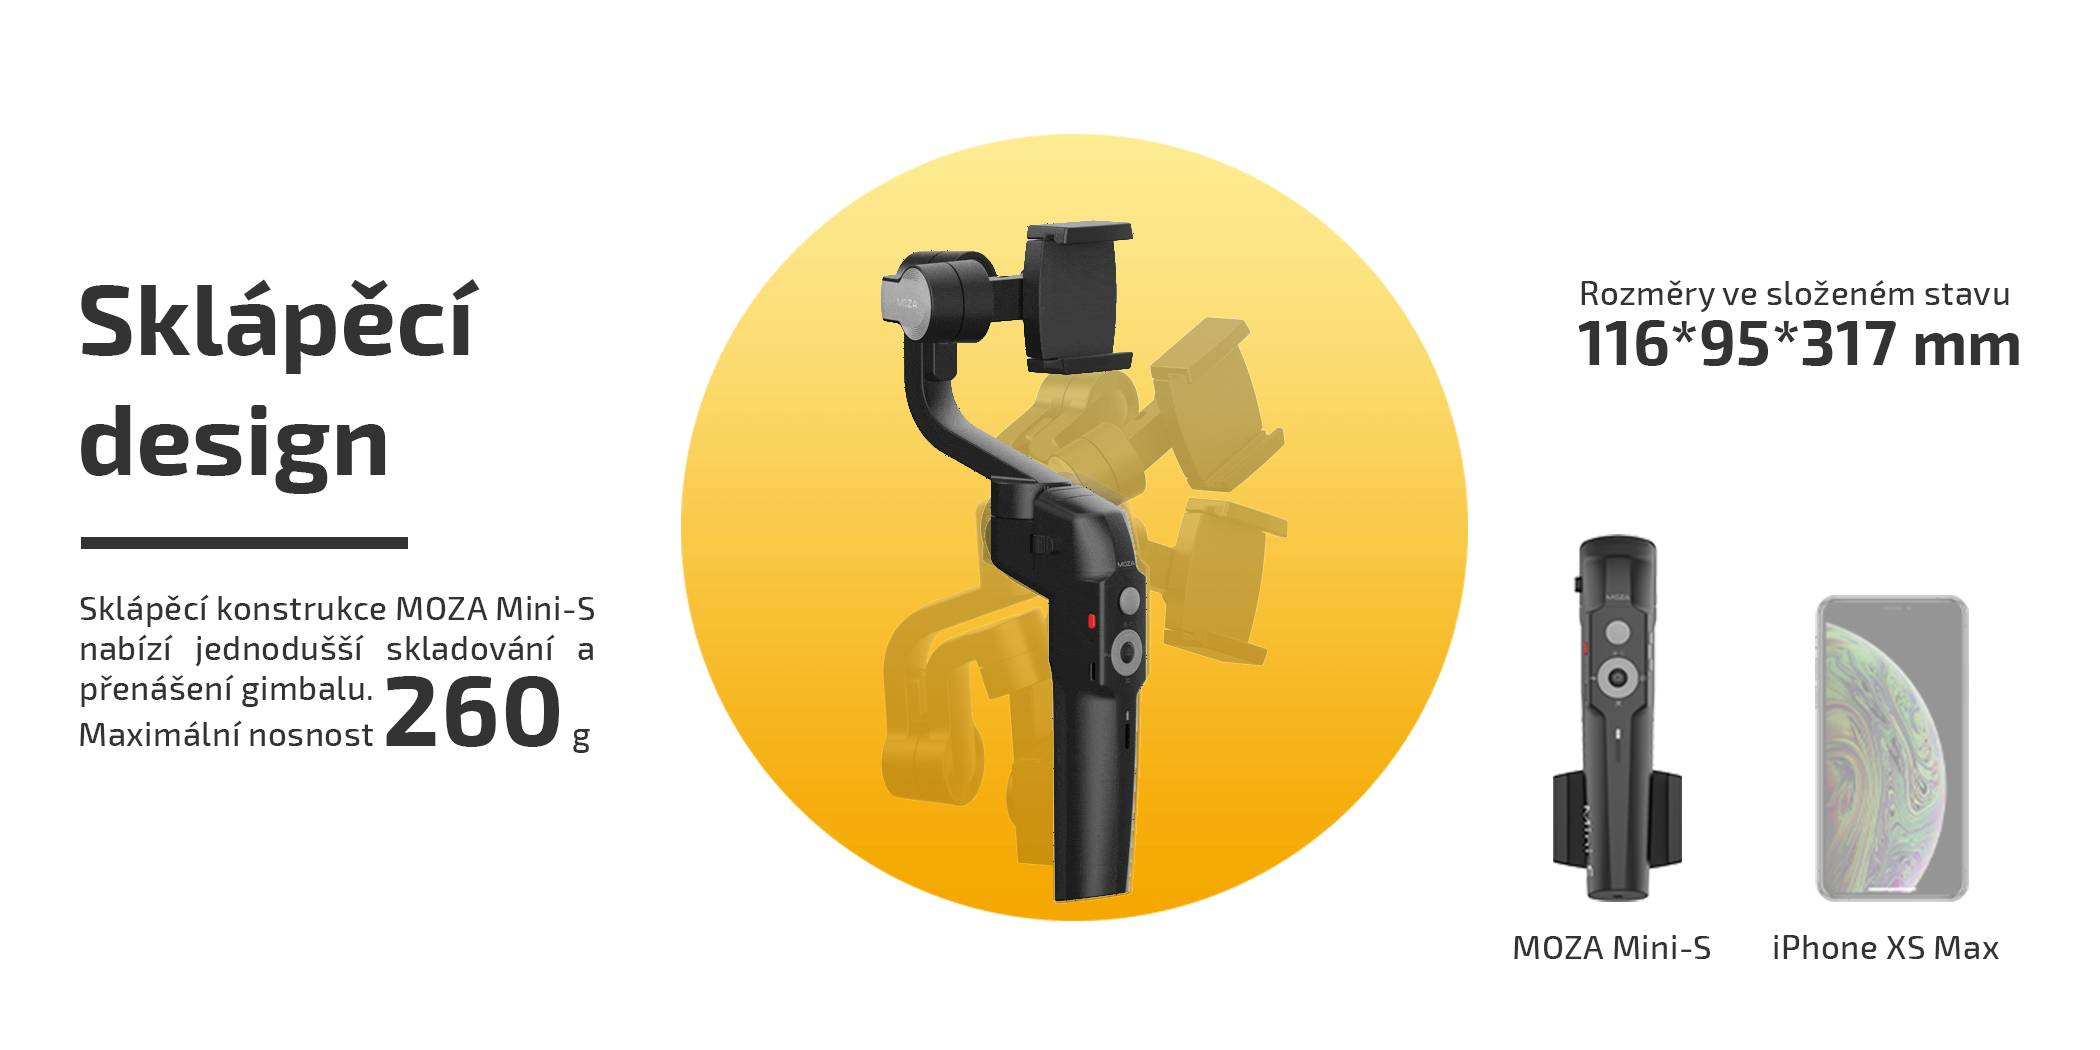 film-technika-gudsen-moza-mini-s-gimbal-pro-smartphony-skápěcí-design